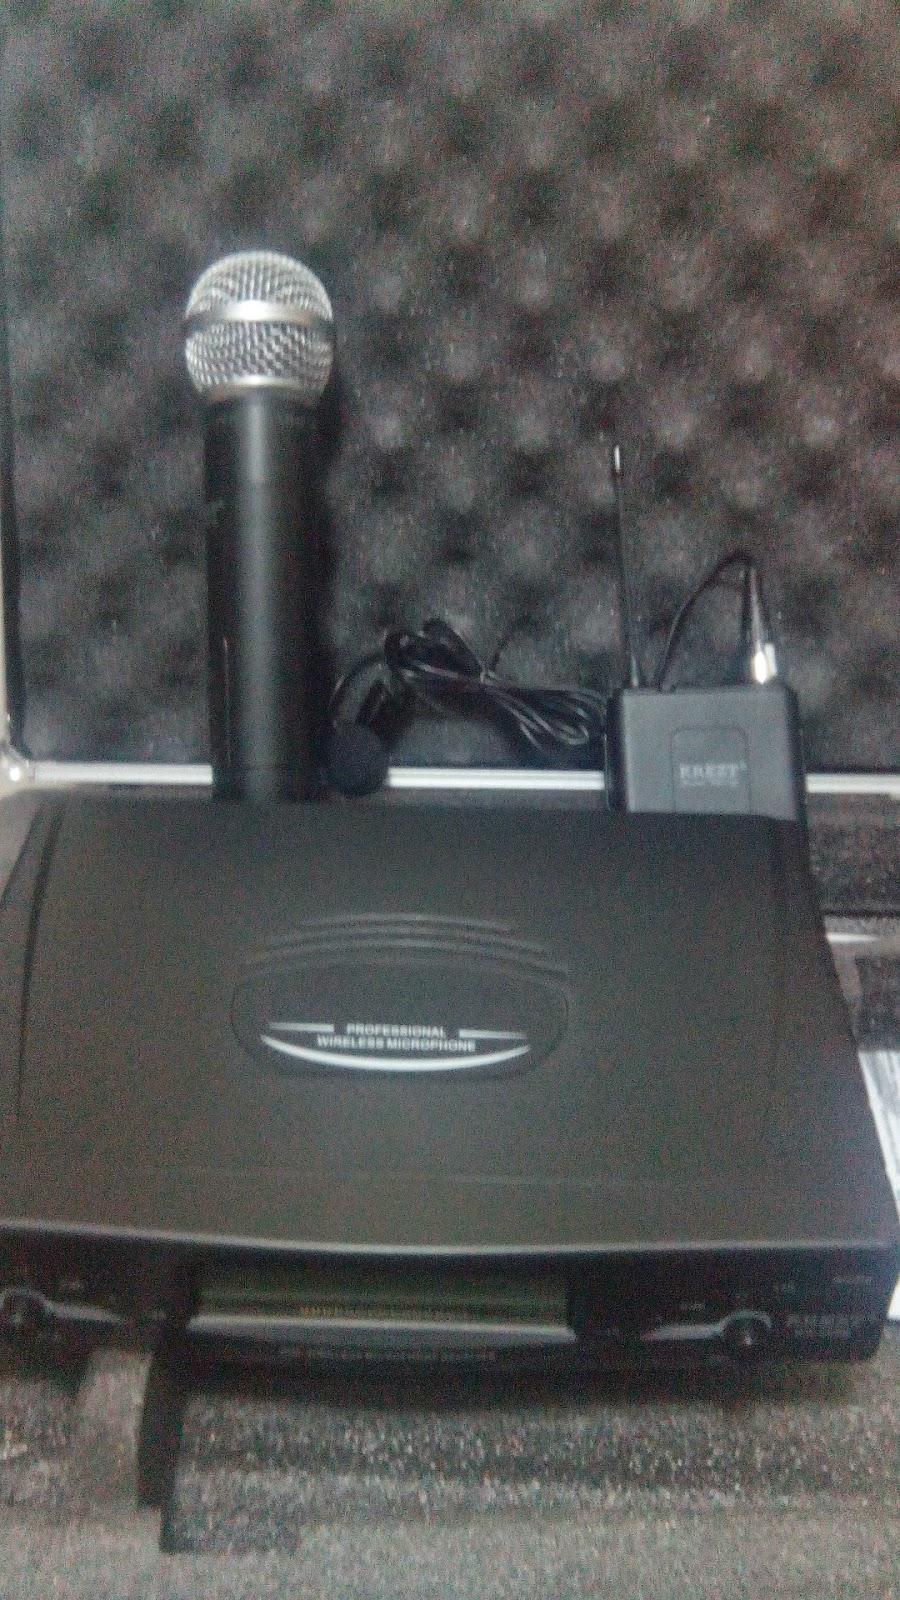 Jasa Sewa Mic Wireless Dan Amplifire Speaker Outdoor Toa Zw G810 Auto Reverse Dilengkapi Dengan Volume Control Pengatur Kecepatan Tape Dapat Merekam Langsung Dari Amplifier Kami Juga Menyediakan